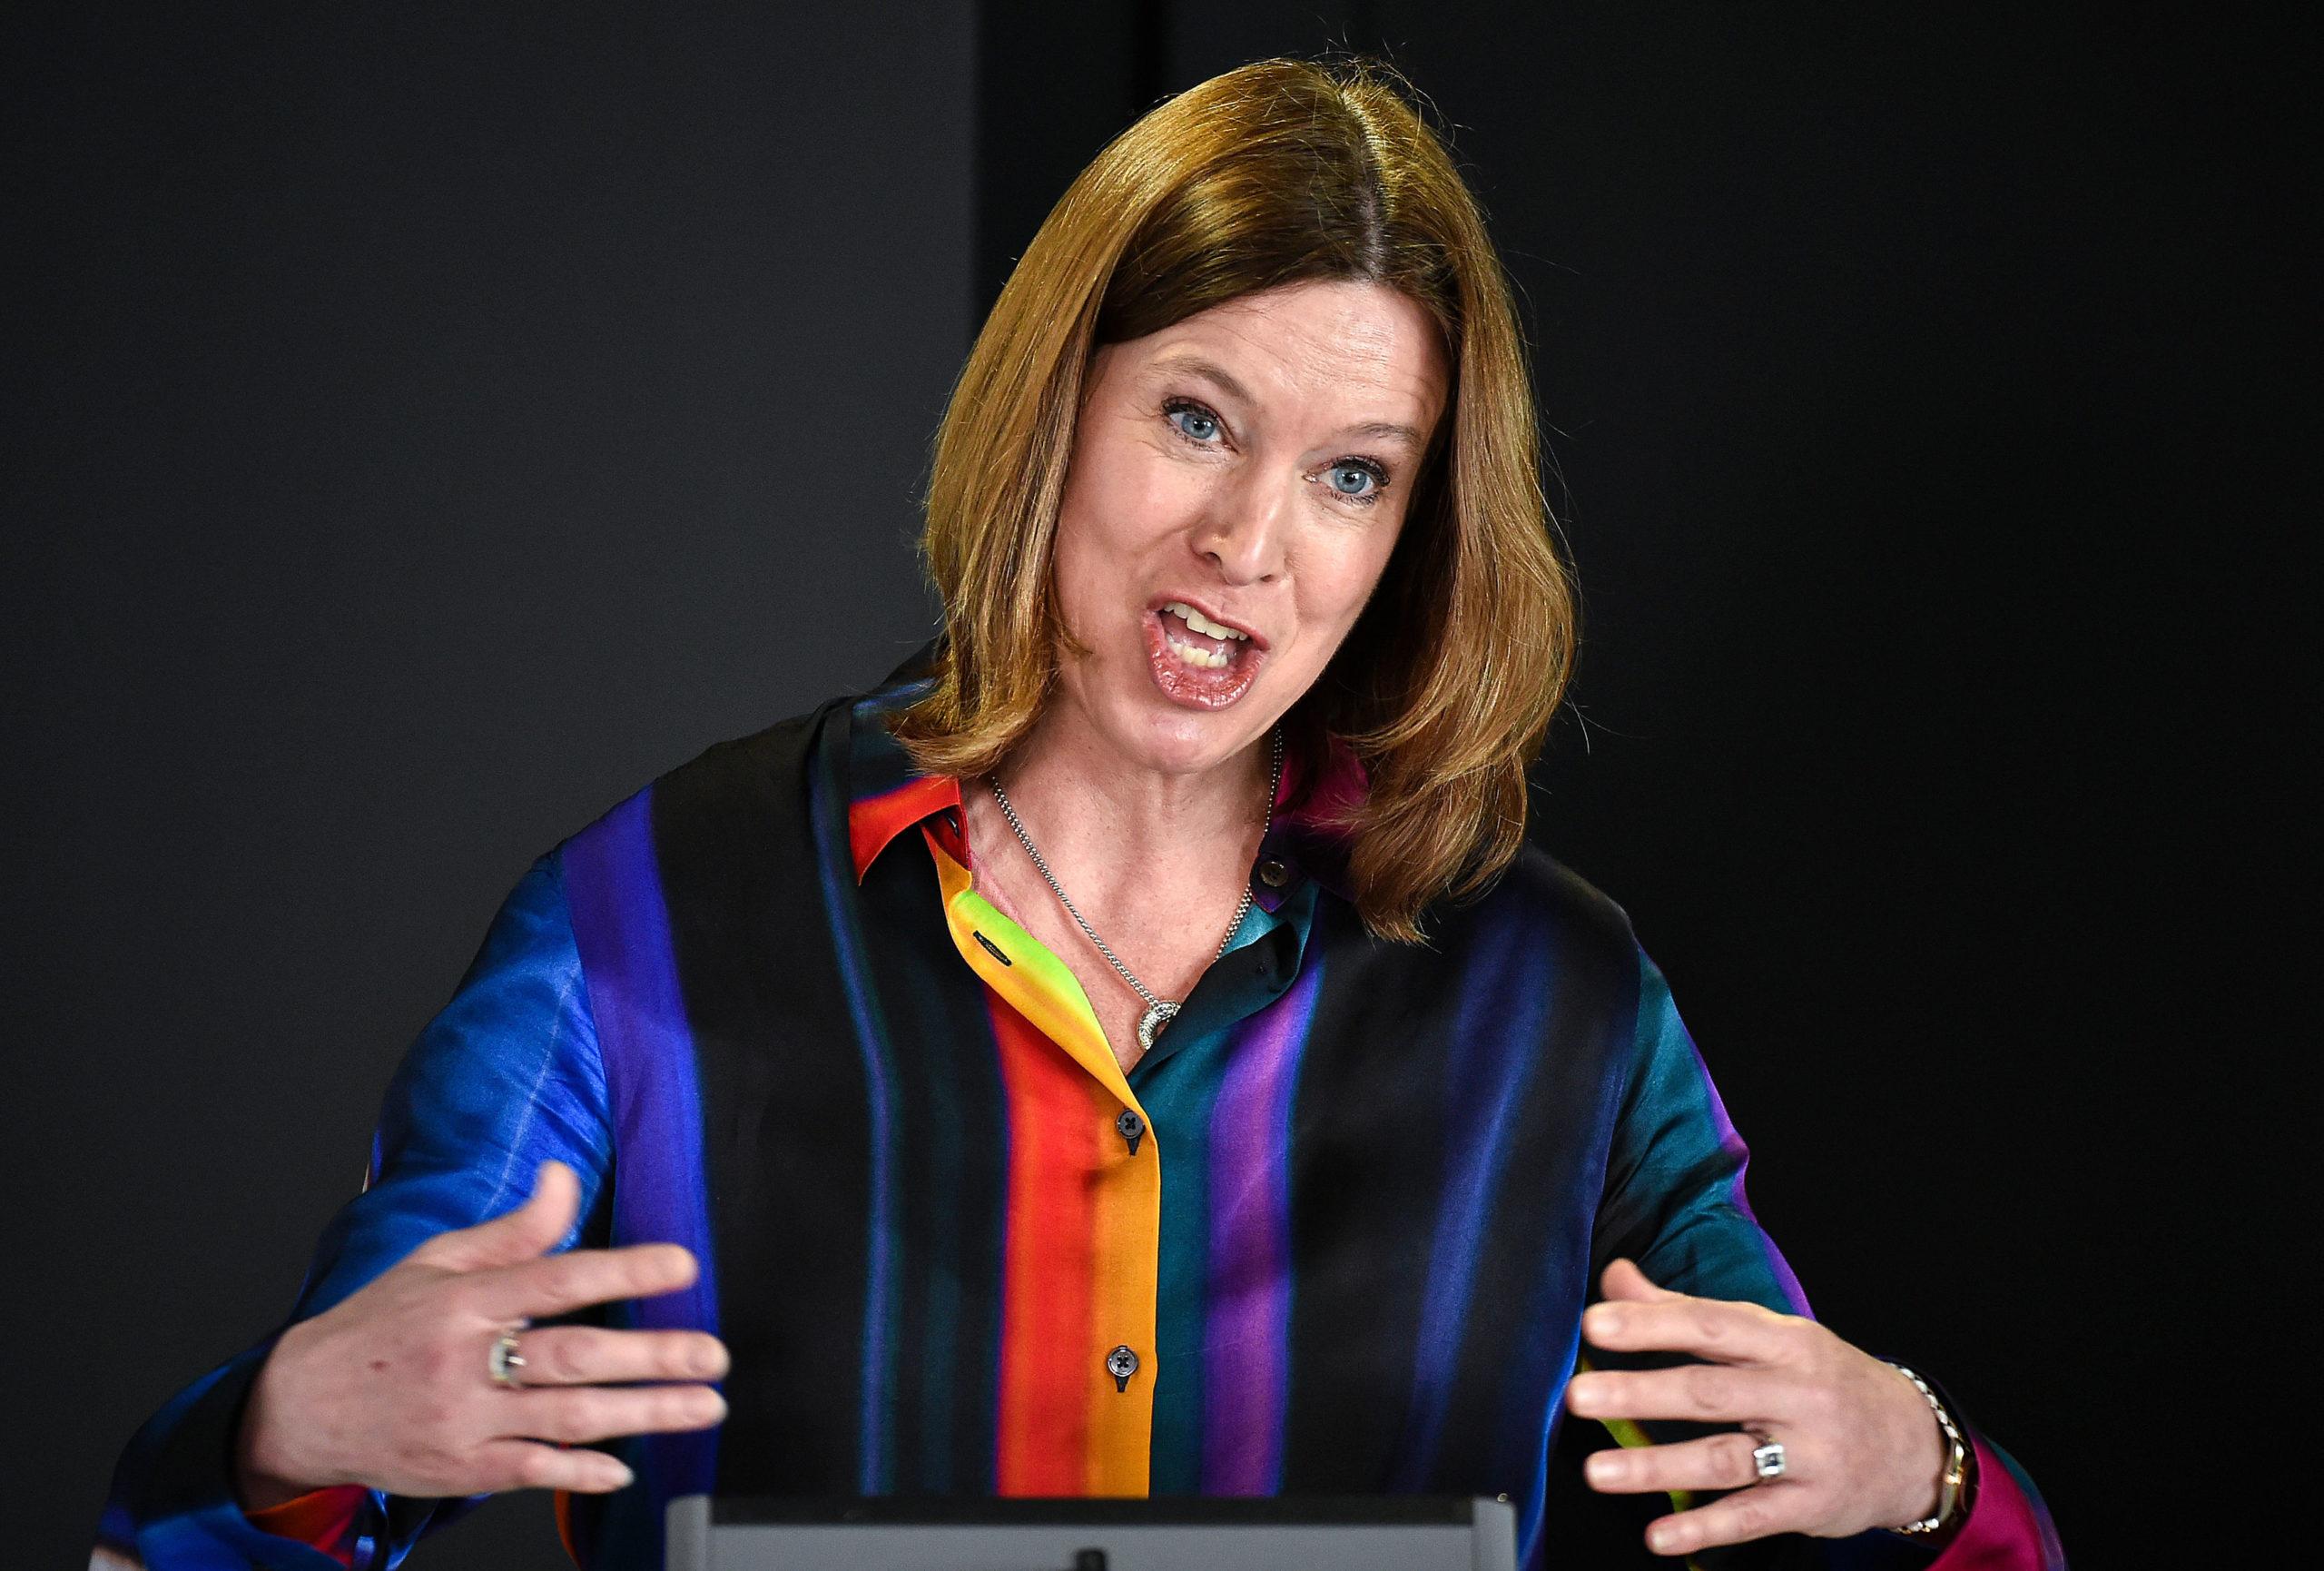 Scotland's former C chief M medical O officer Dr Catherine Calderwood.